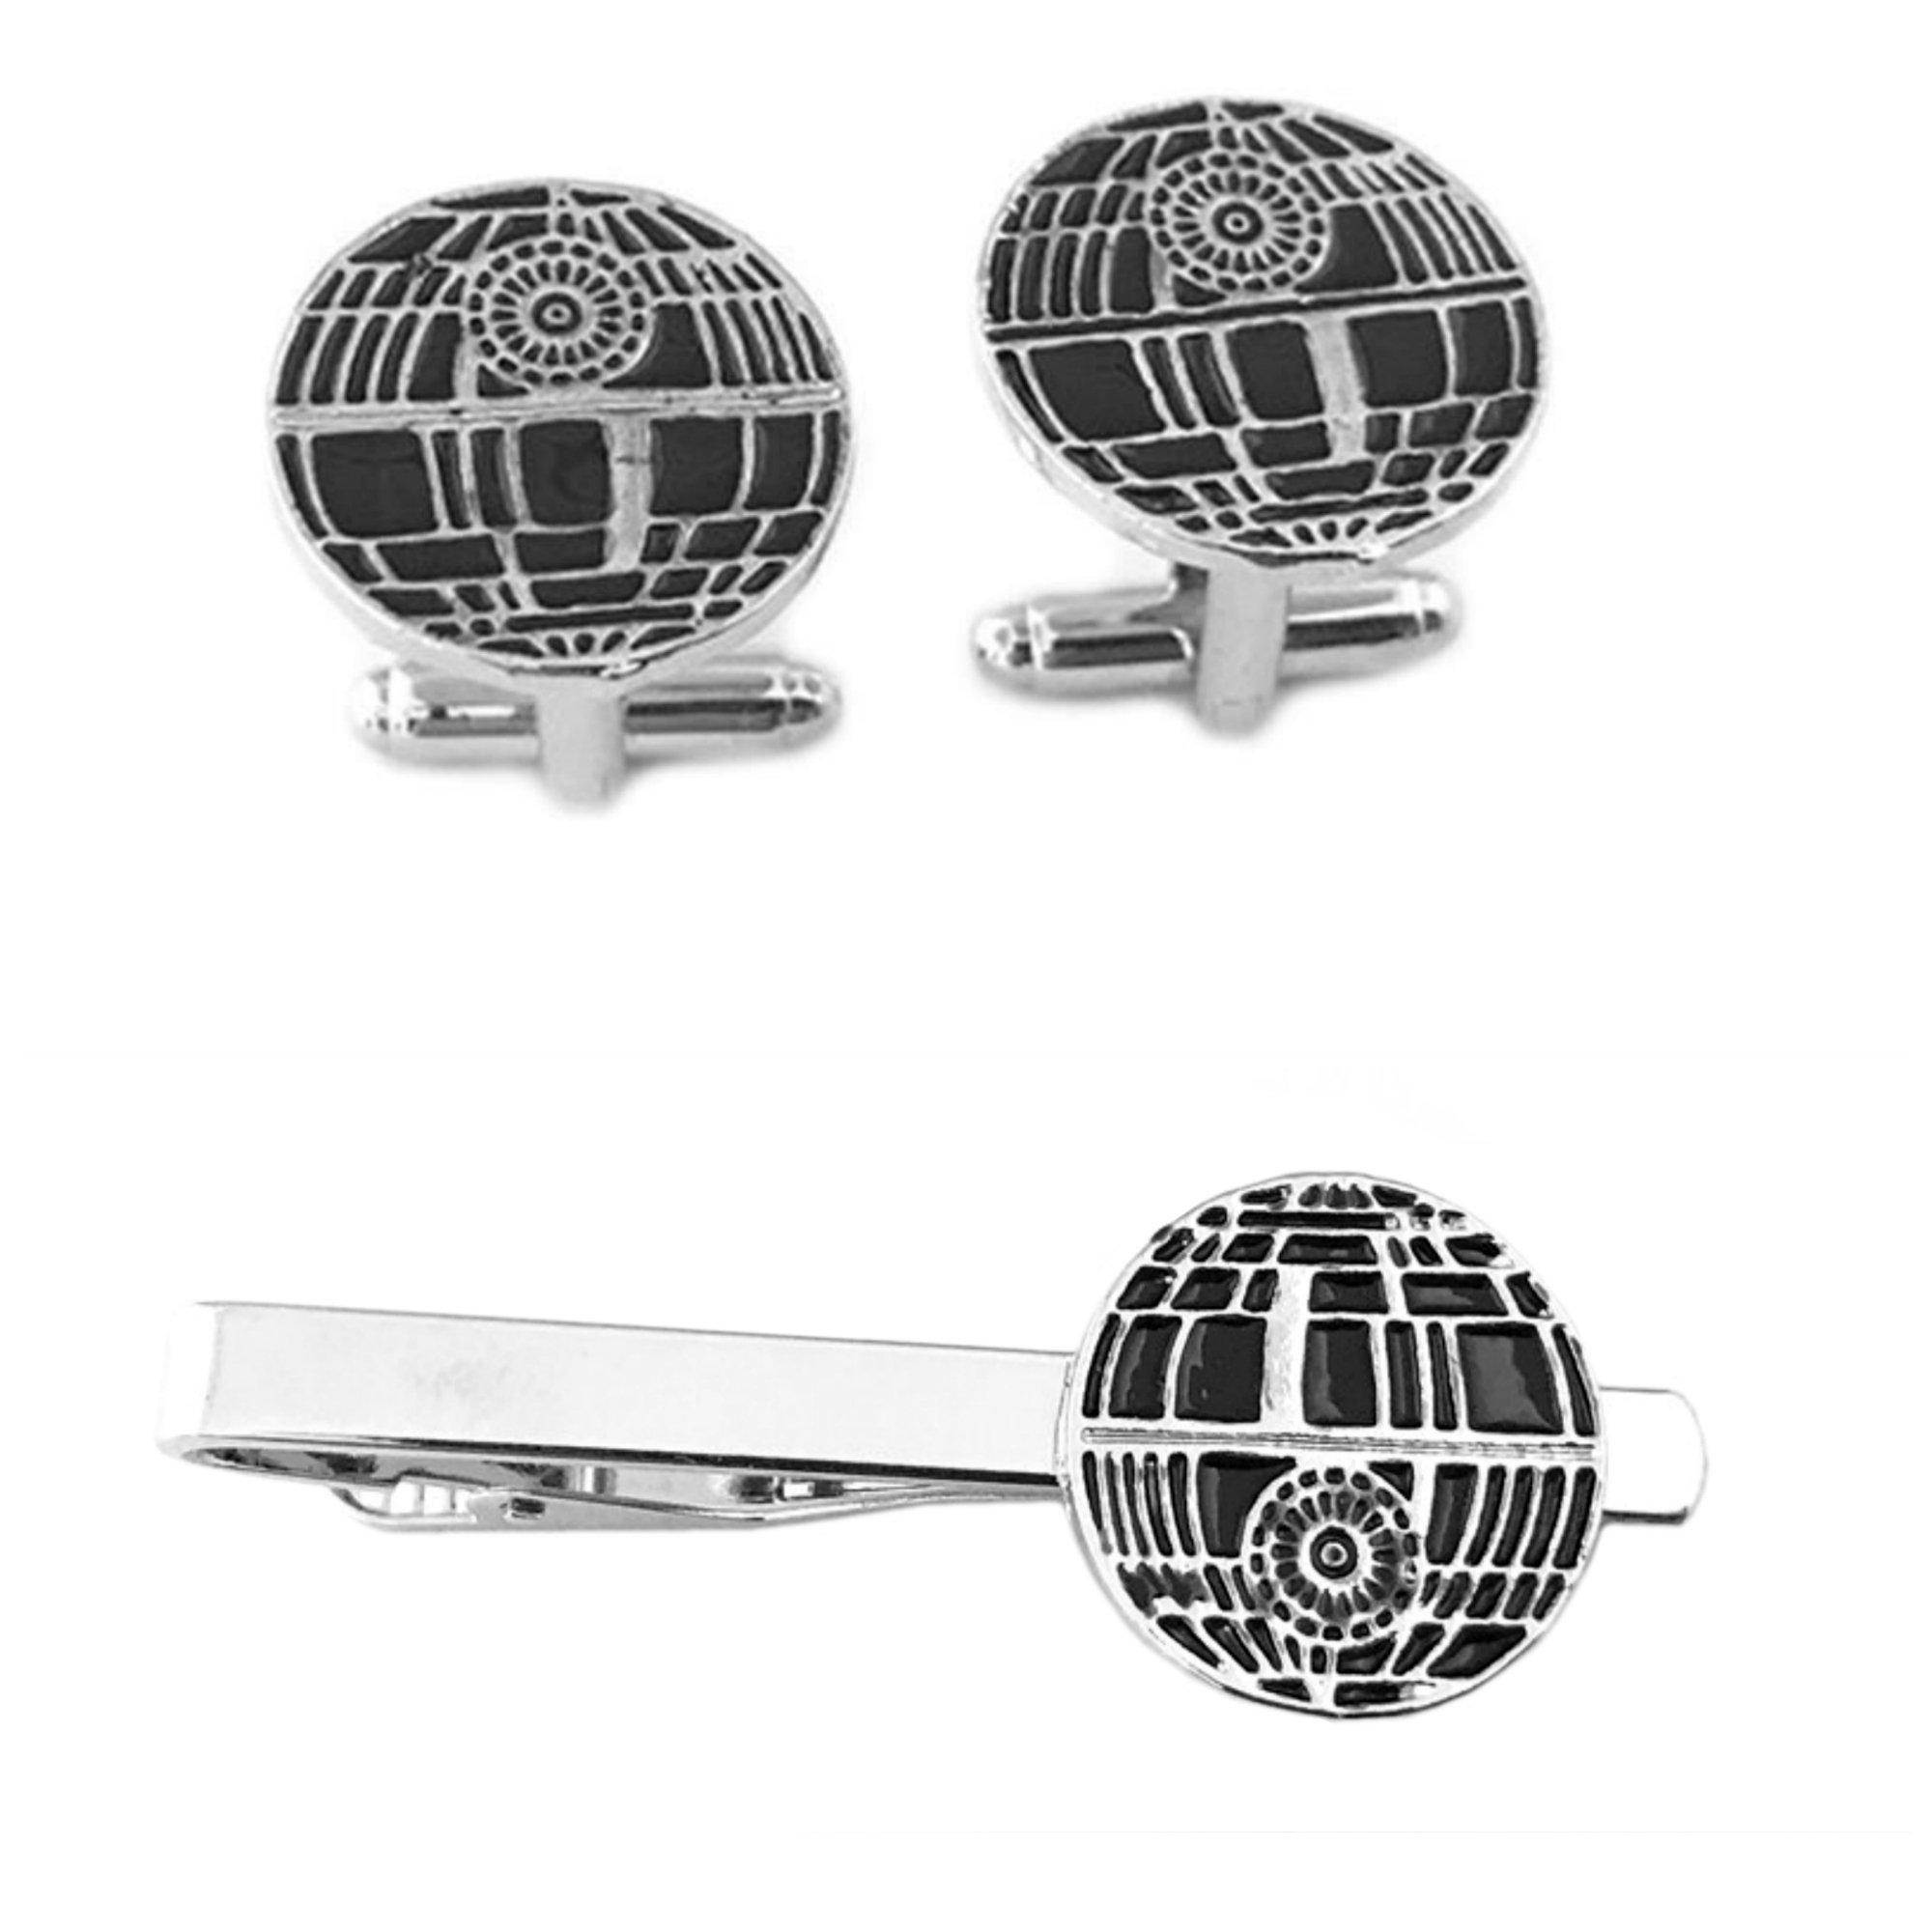 Outlander Death Star Cufflink & Tiebar - New 2018 Star Wars Movies - Set of 2 Wedding Logo w/Gift Box